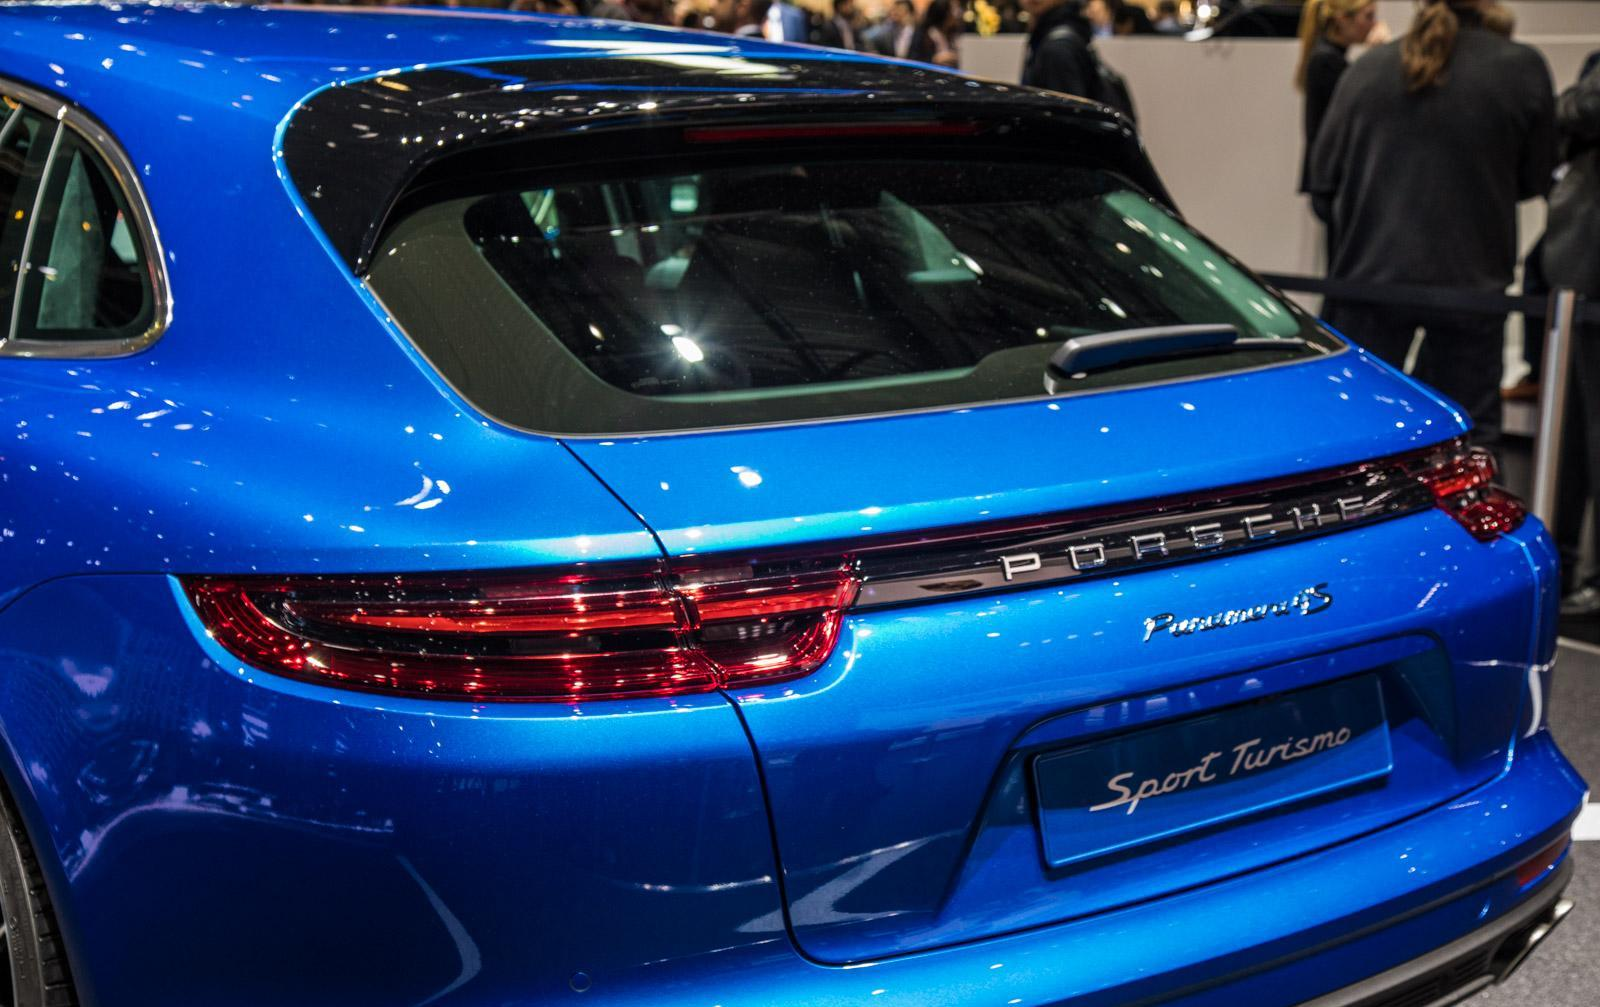 Porsche-Panamera-Sport-Turismo-011